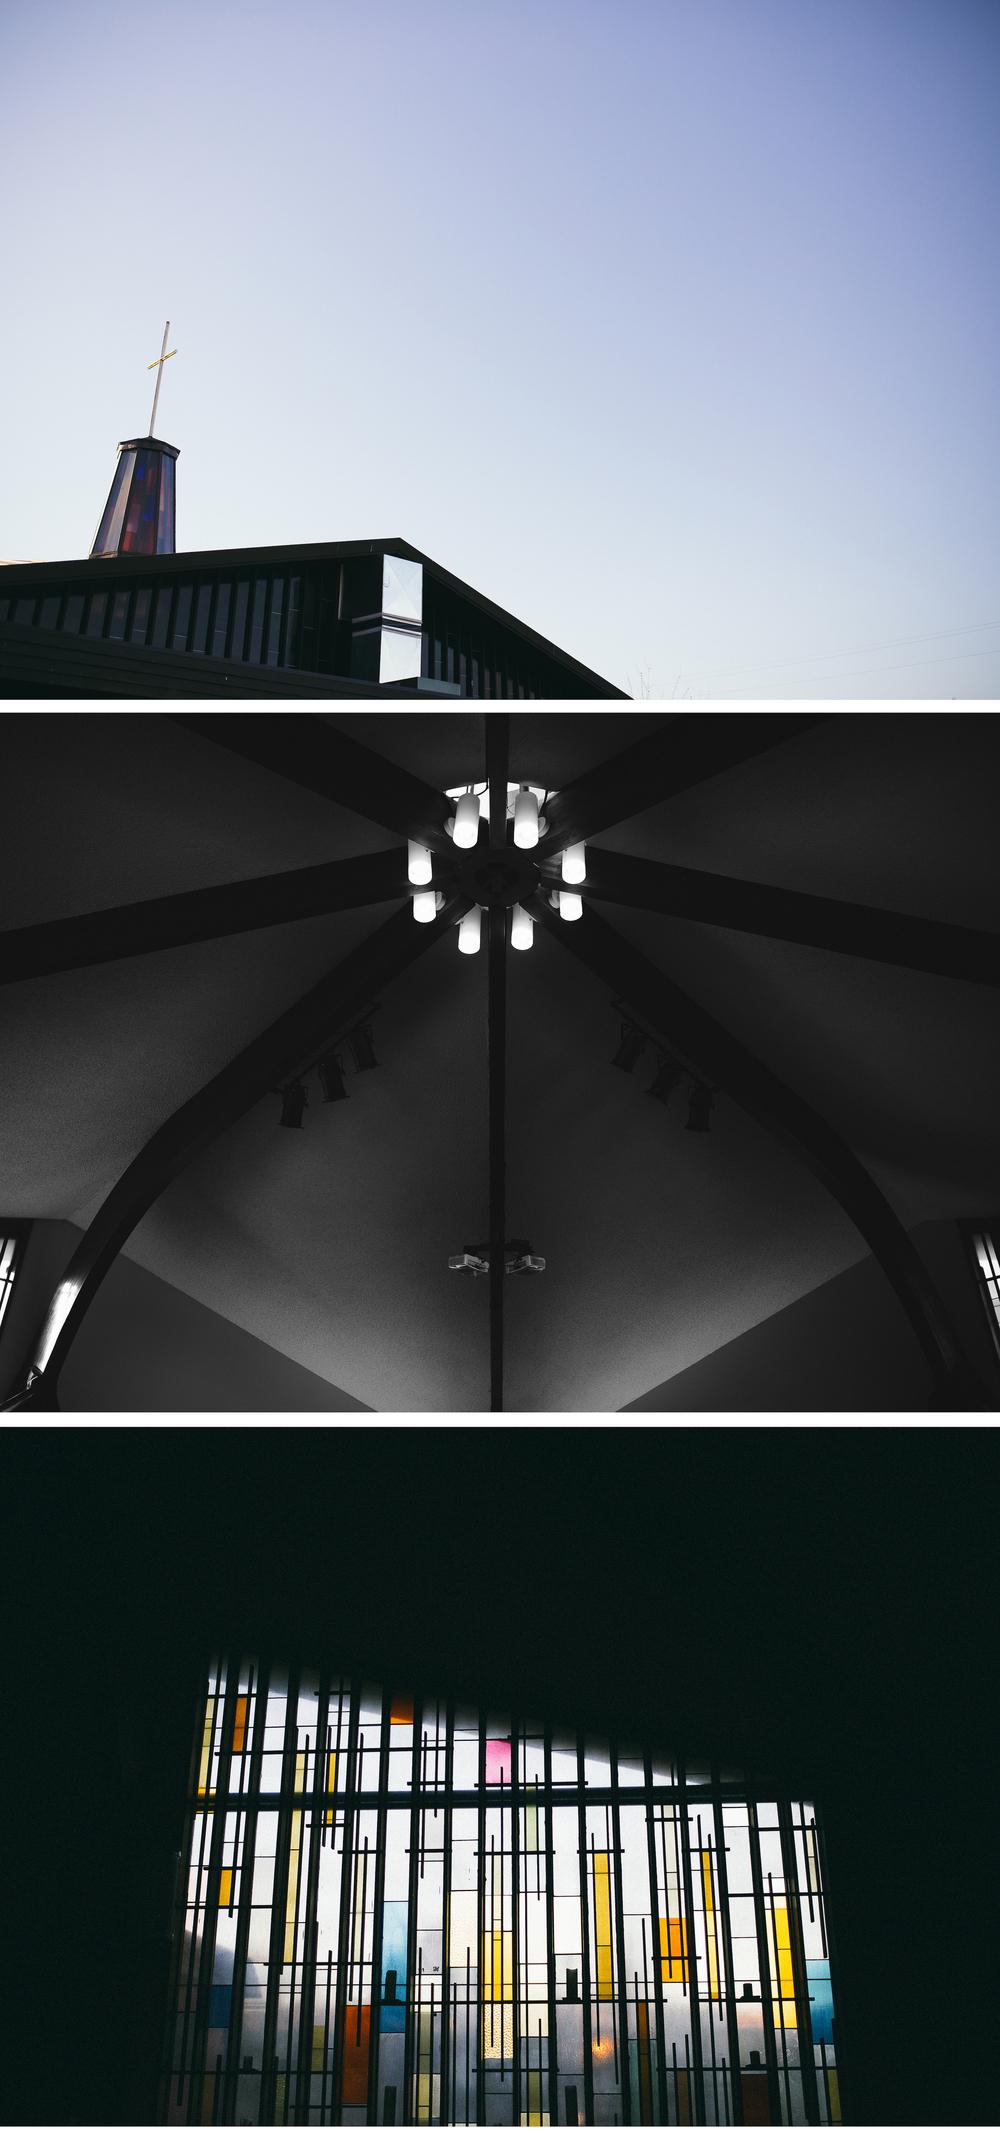 Eklund-Wedding-Quest-Church-1.jpg